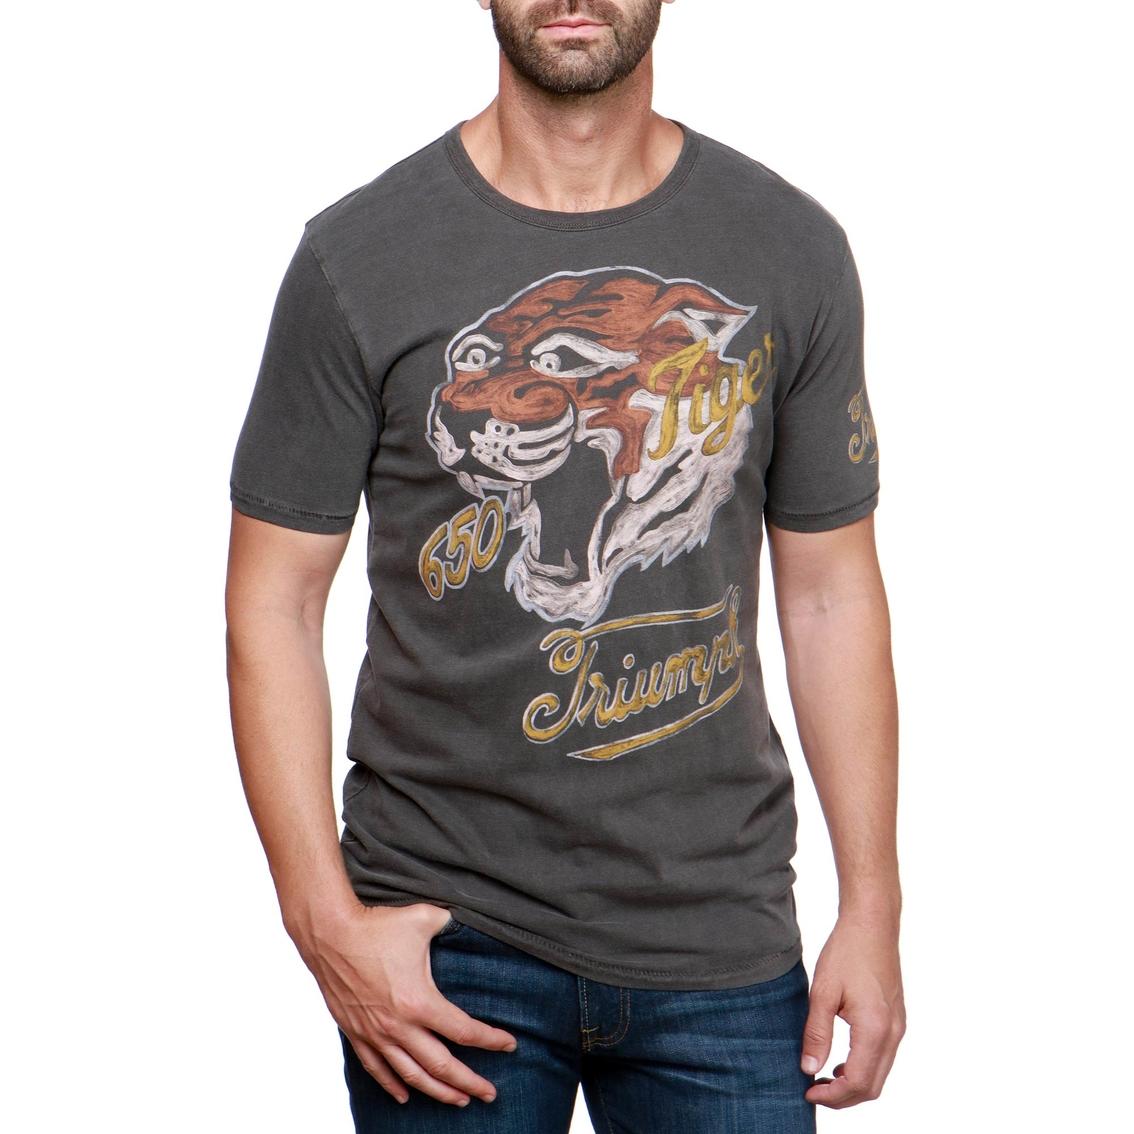 8b066b1b2 Lucky Brand Triumph Tiger Graphic Tee | T-shirts | Apparel | Shop ...